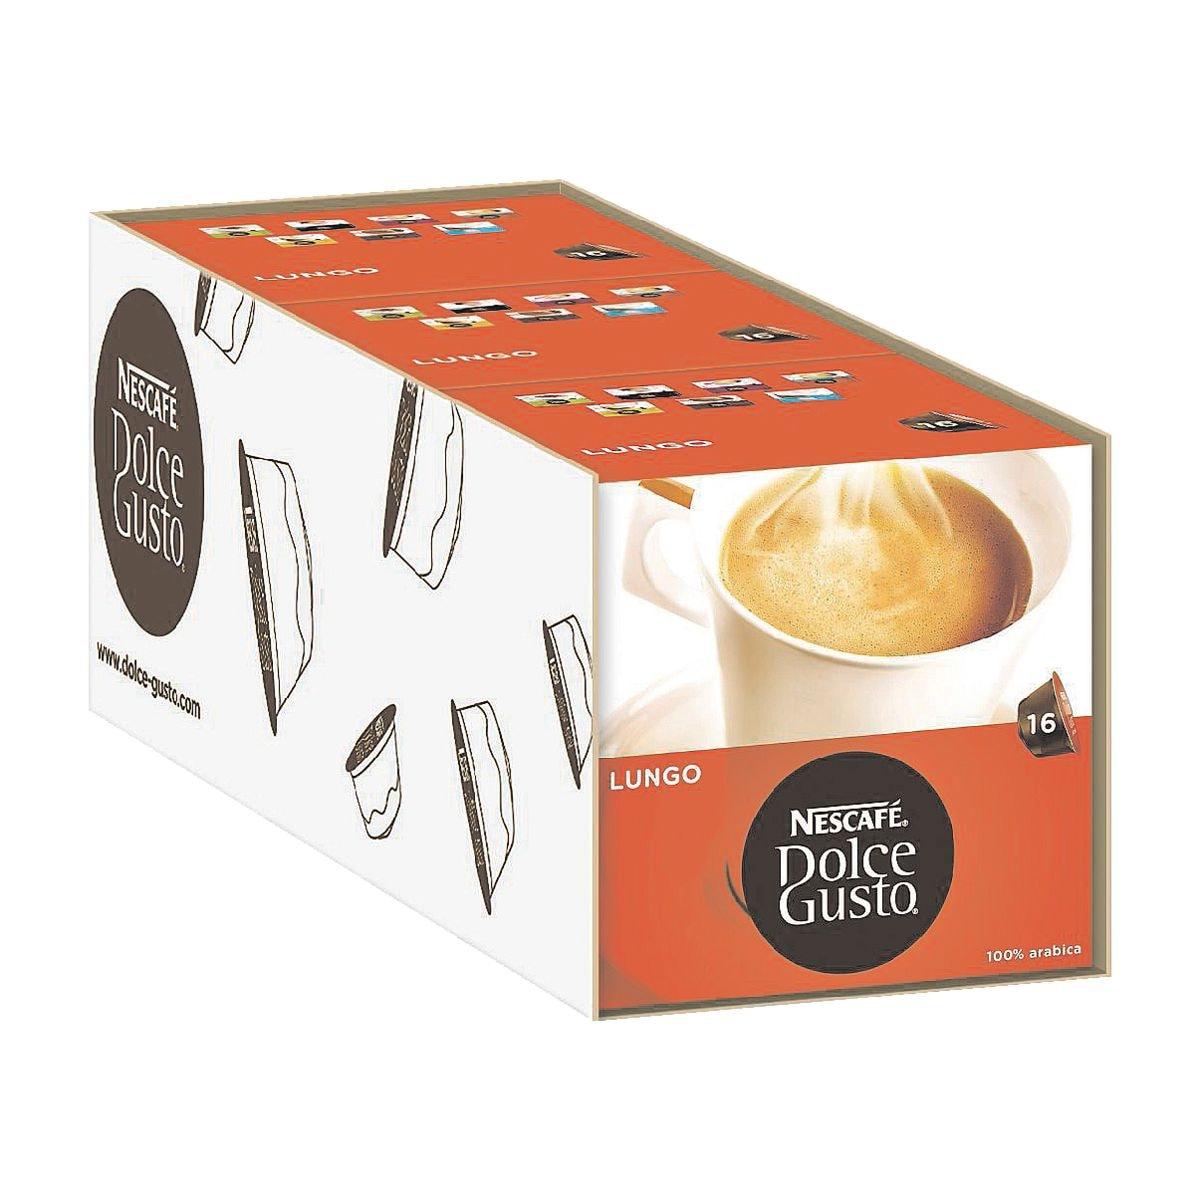 nescafe 3 packungen kaffeekapseln dolce gusto caff lungo bei otto office g nstig kaufen. Black Bedroom Furniture Sets. Home Design Ideas